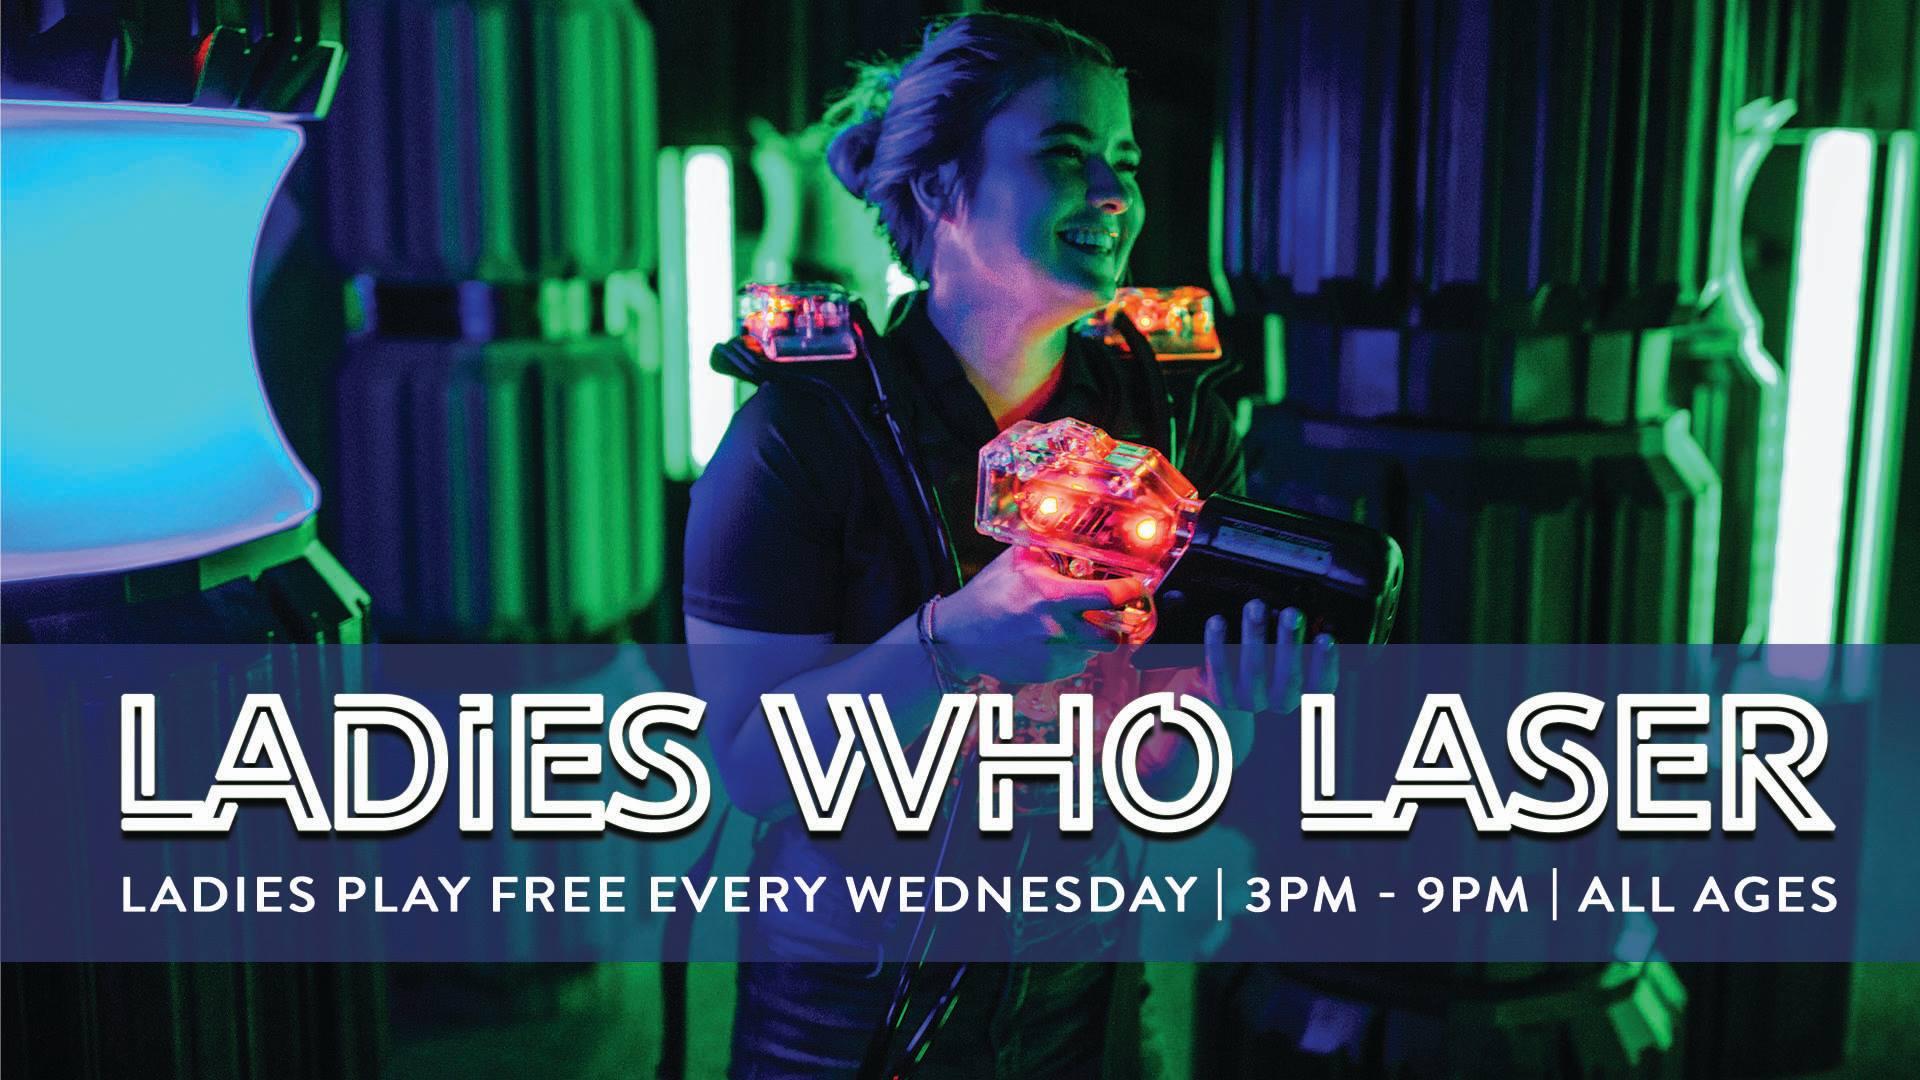 Gig Harbor Events, Ladies Who Laser, Ocean5, Venue, Games, Wine